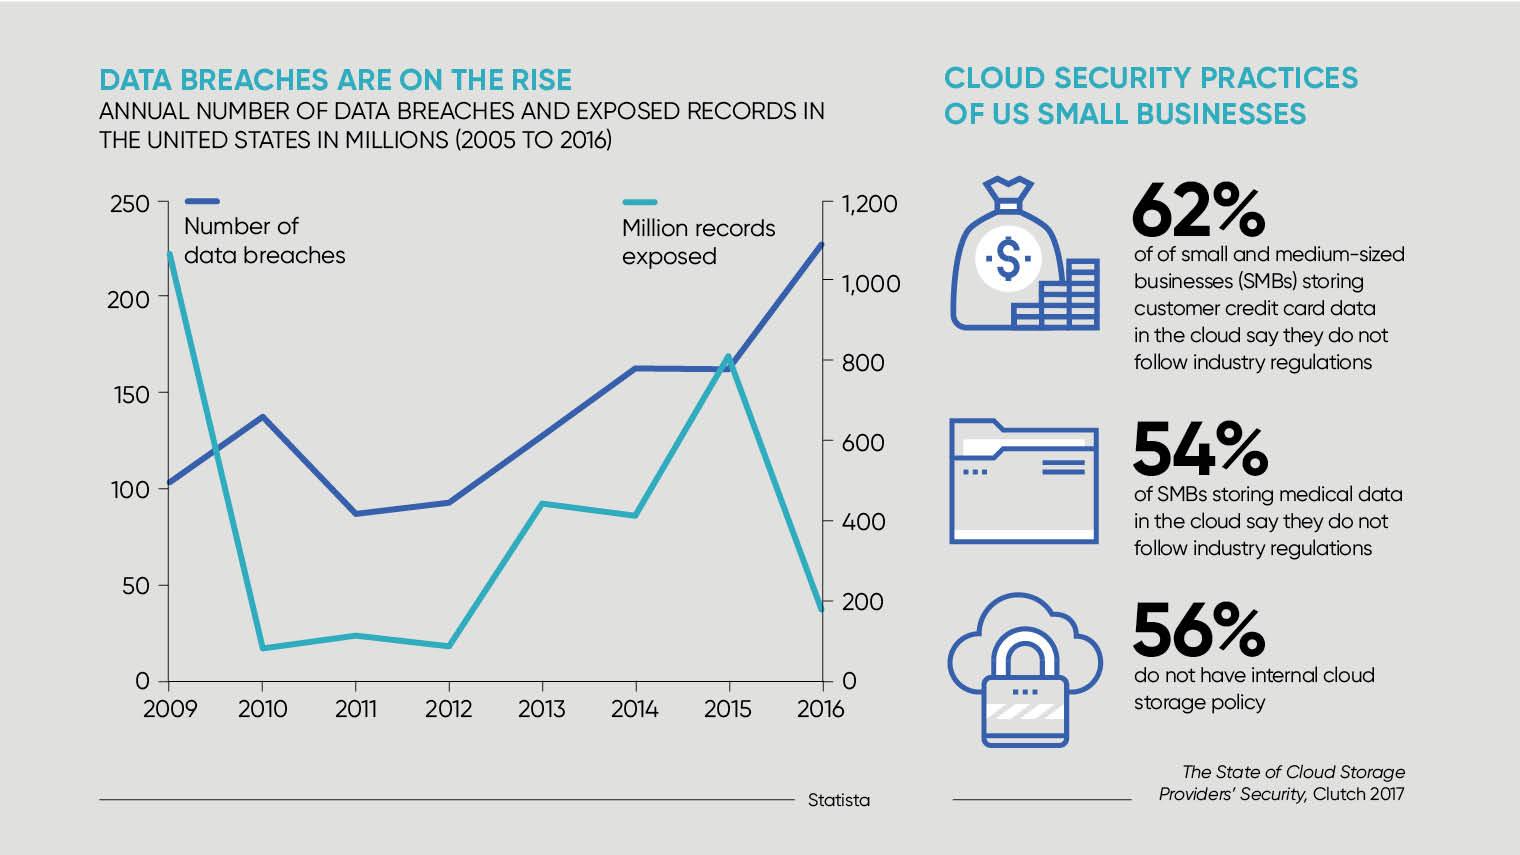 Data breaches on rise chart